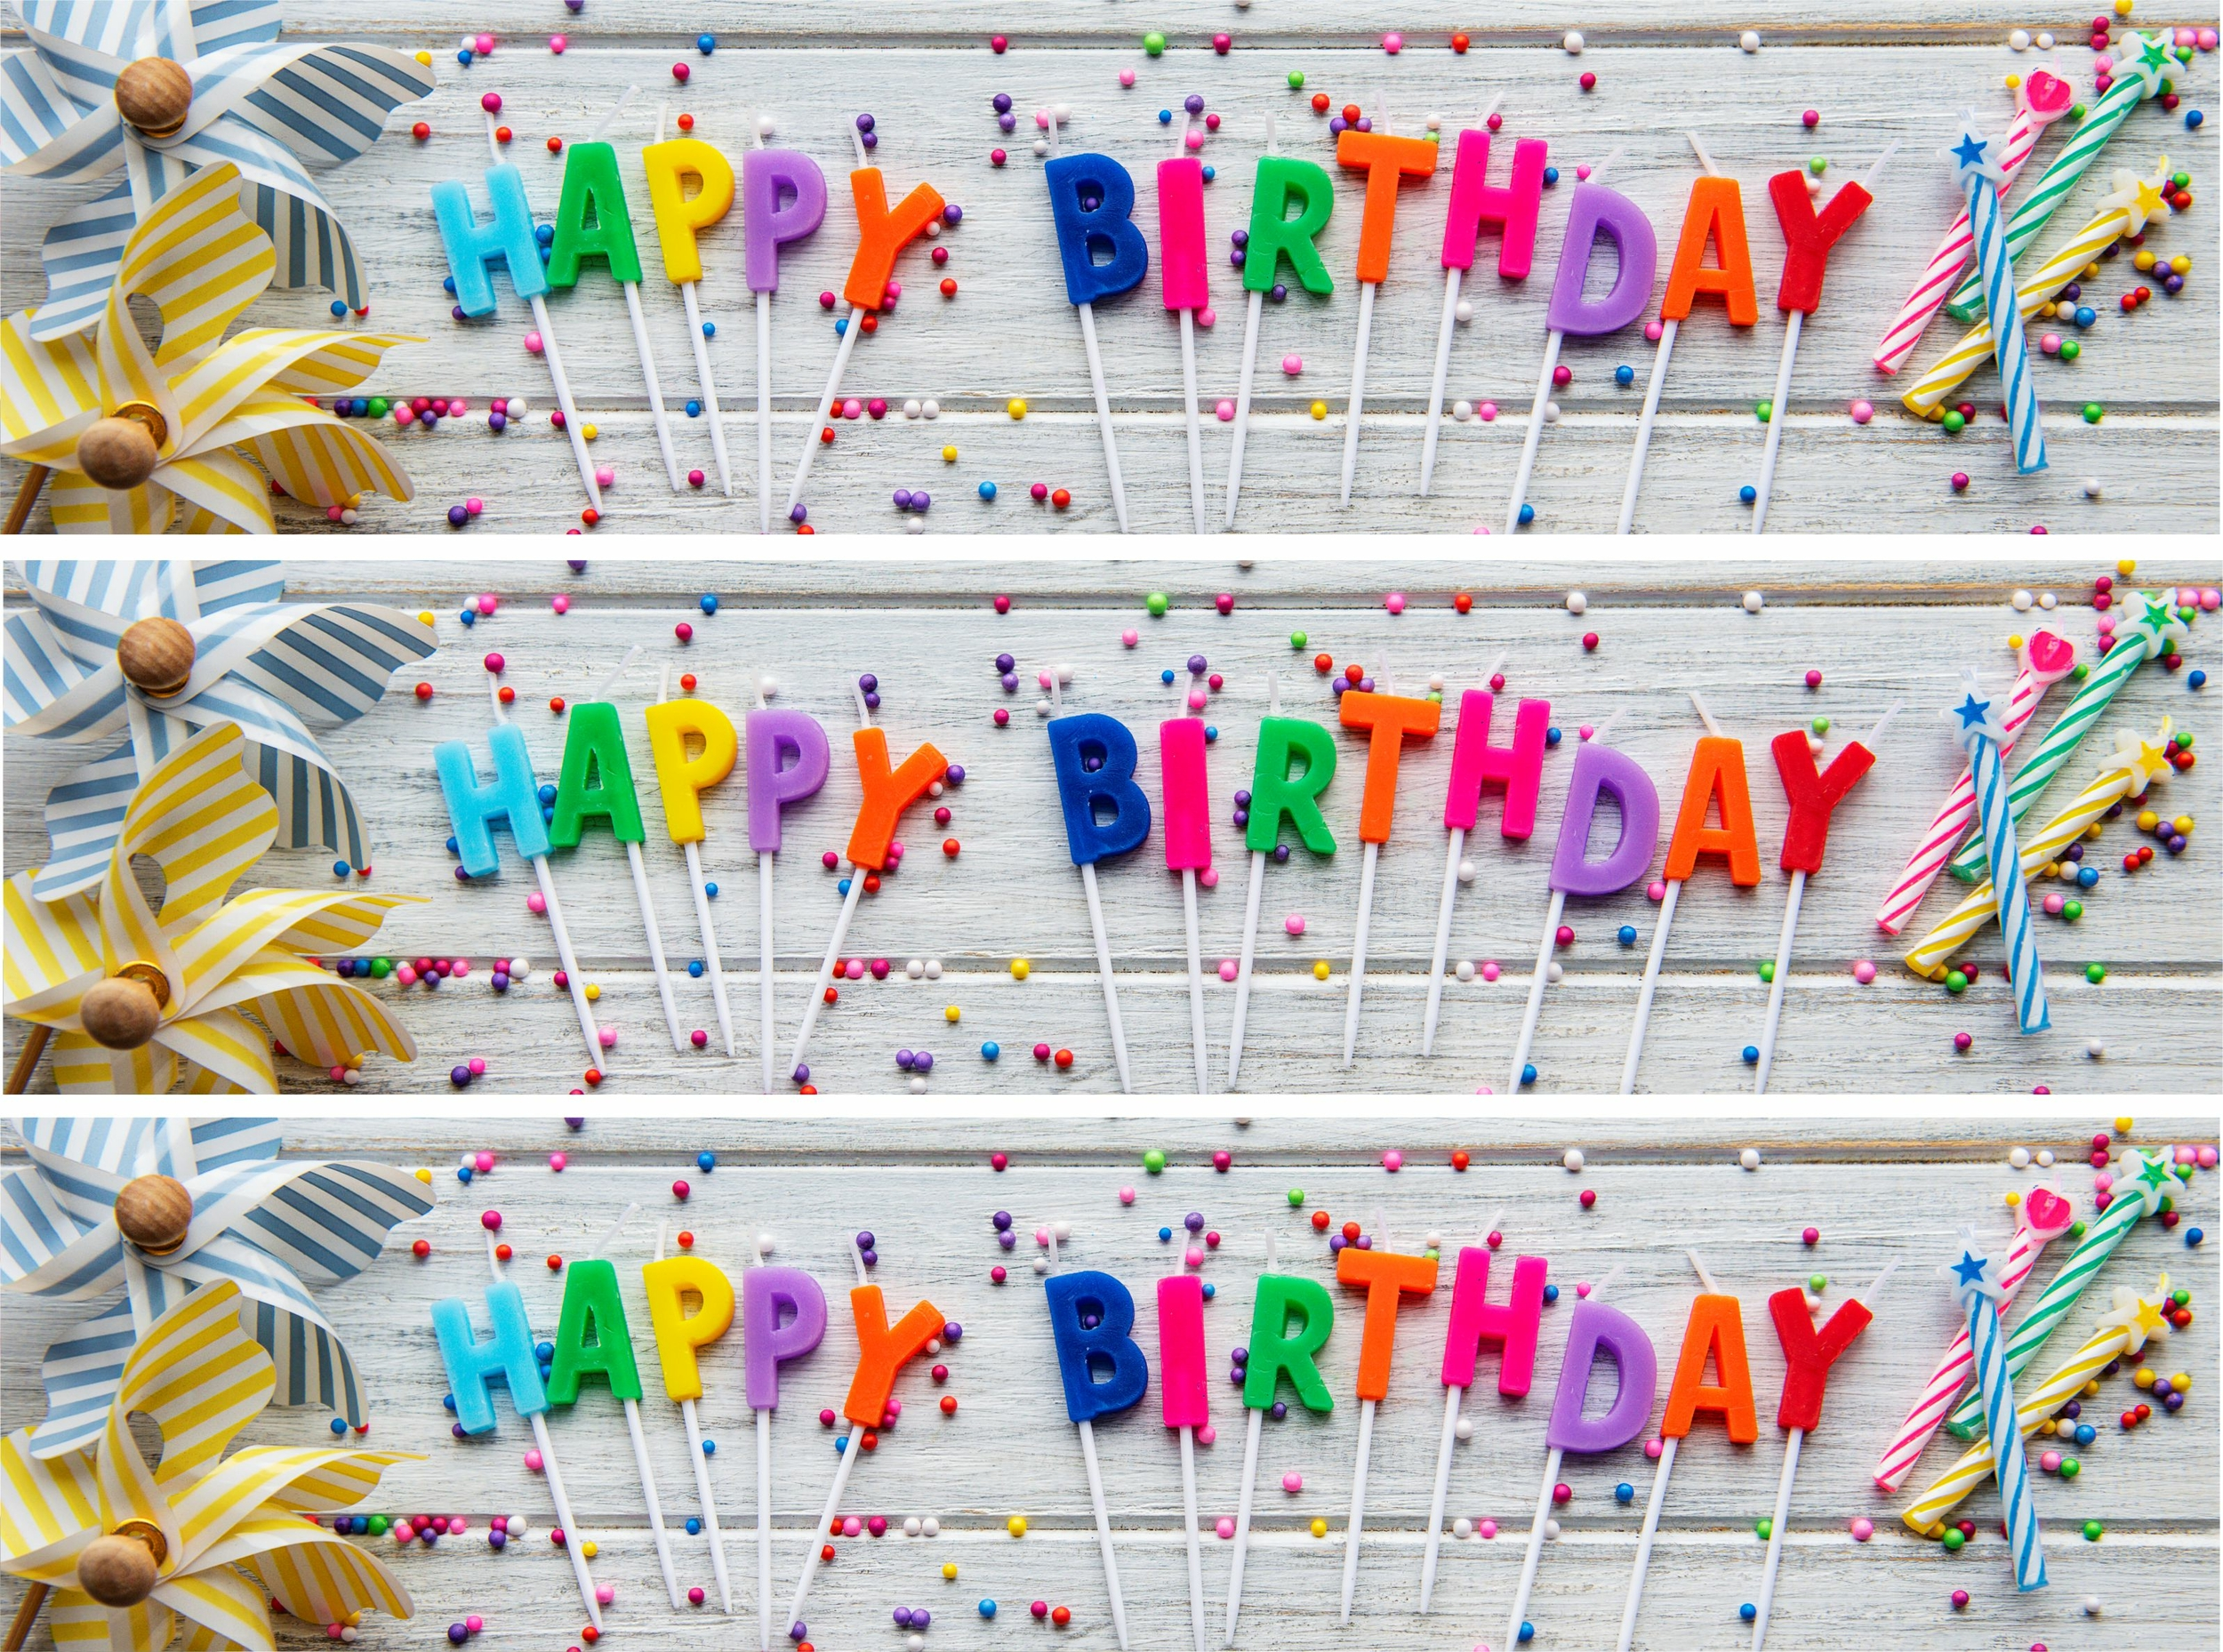 Contour de gâteau - Happy Birthday Bougies